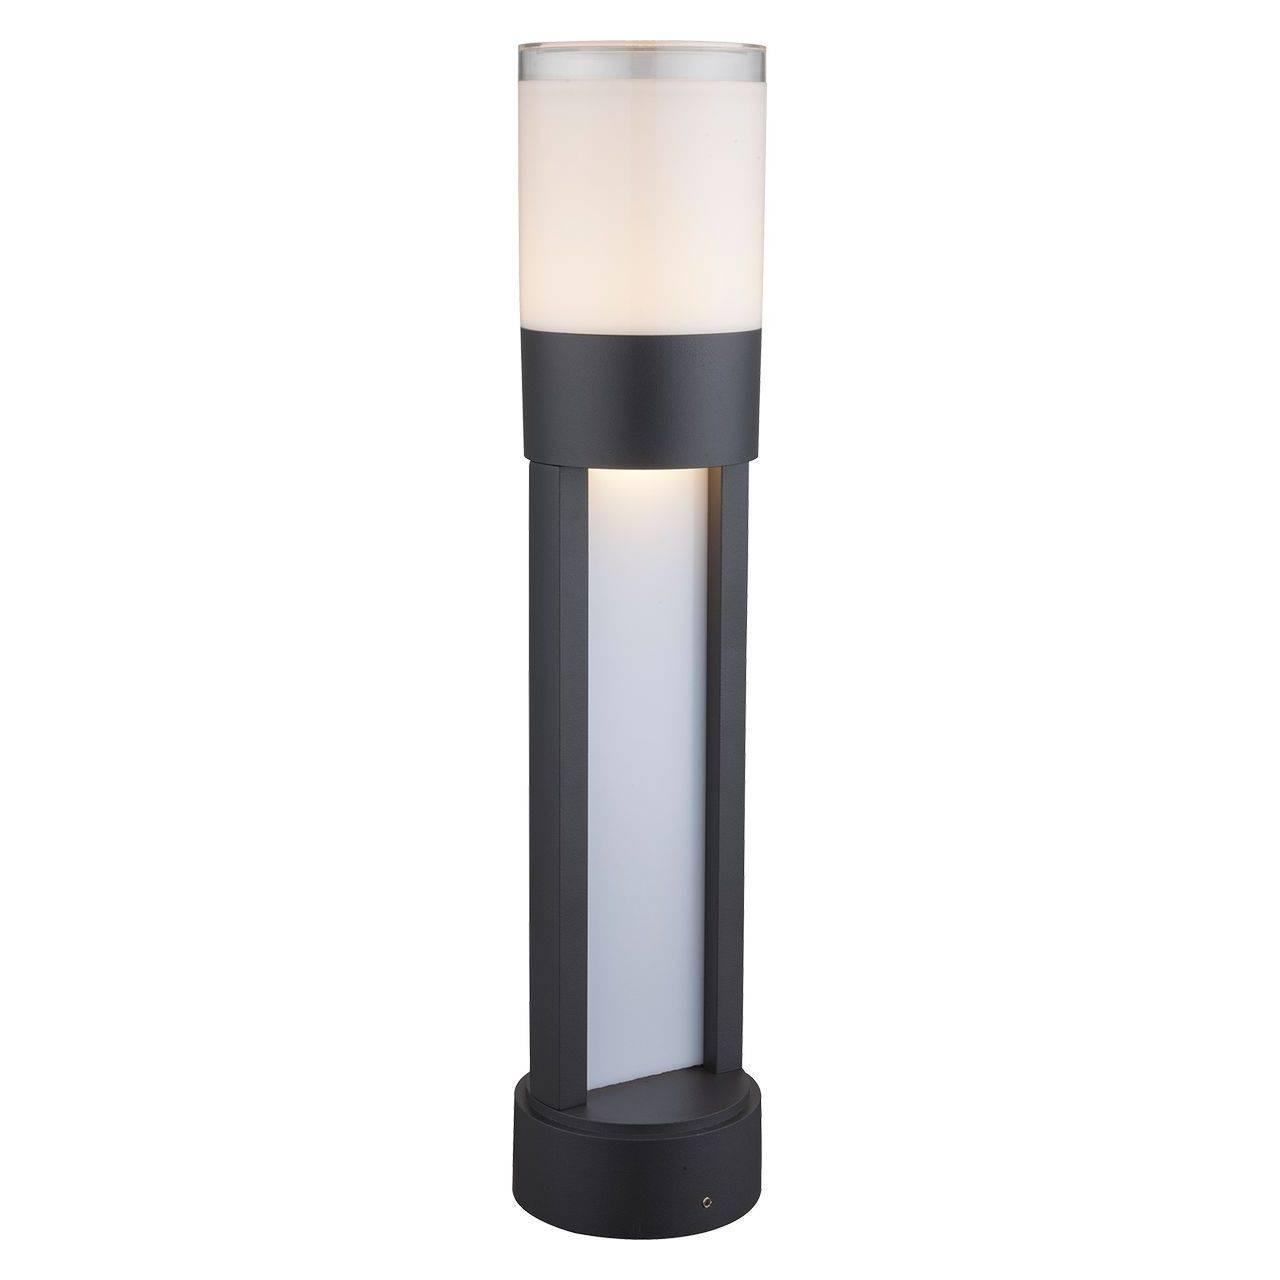 Уличный светодиодный светильник Globo Nexa 34012 globo уличный светодиодный светильник globo nexa 34012